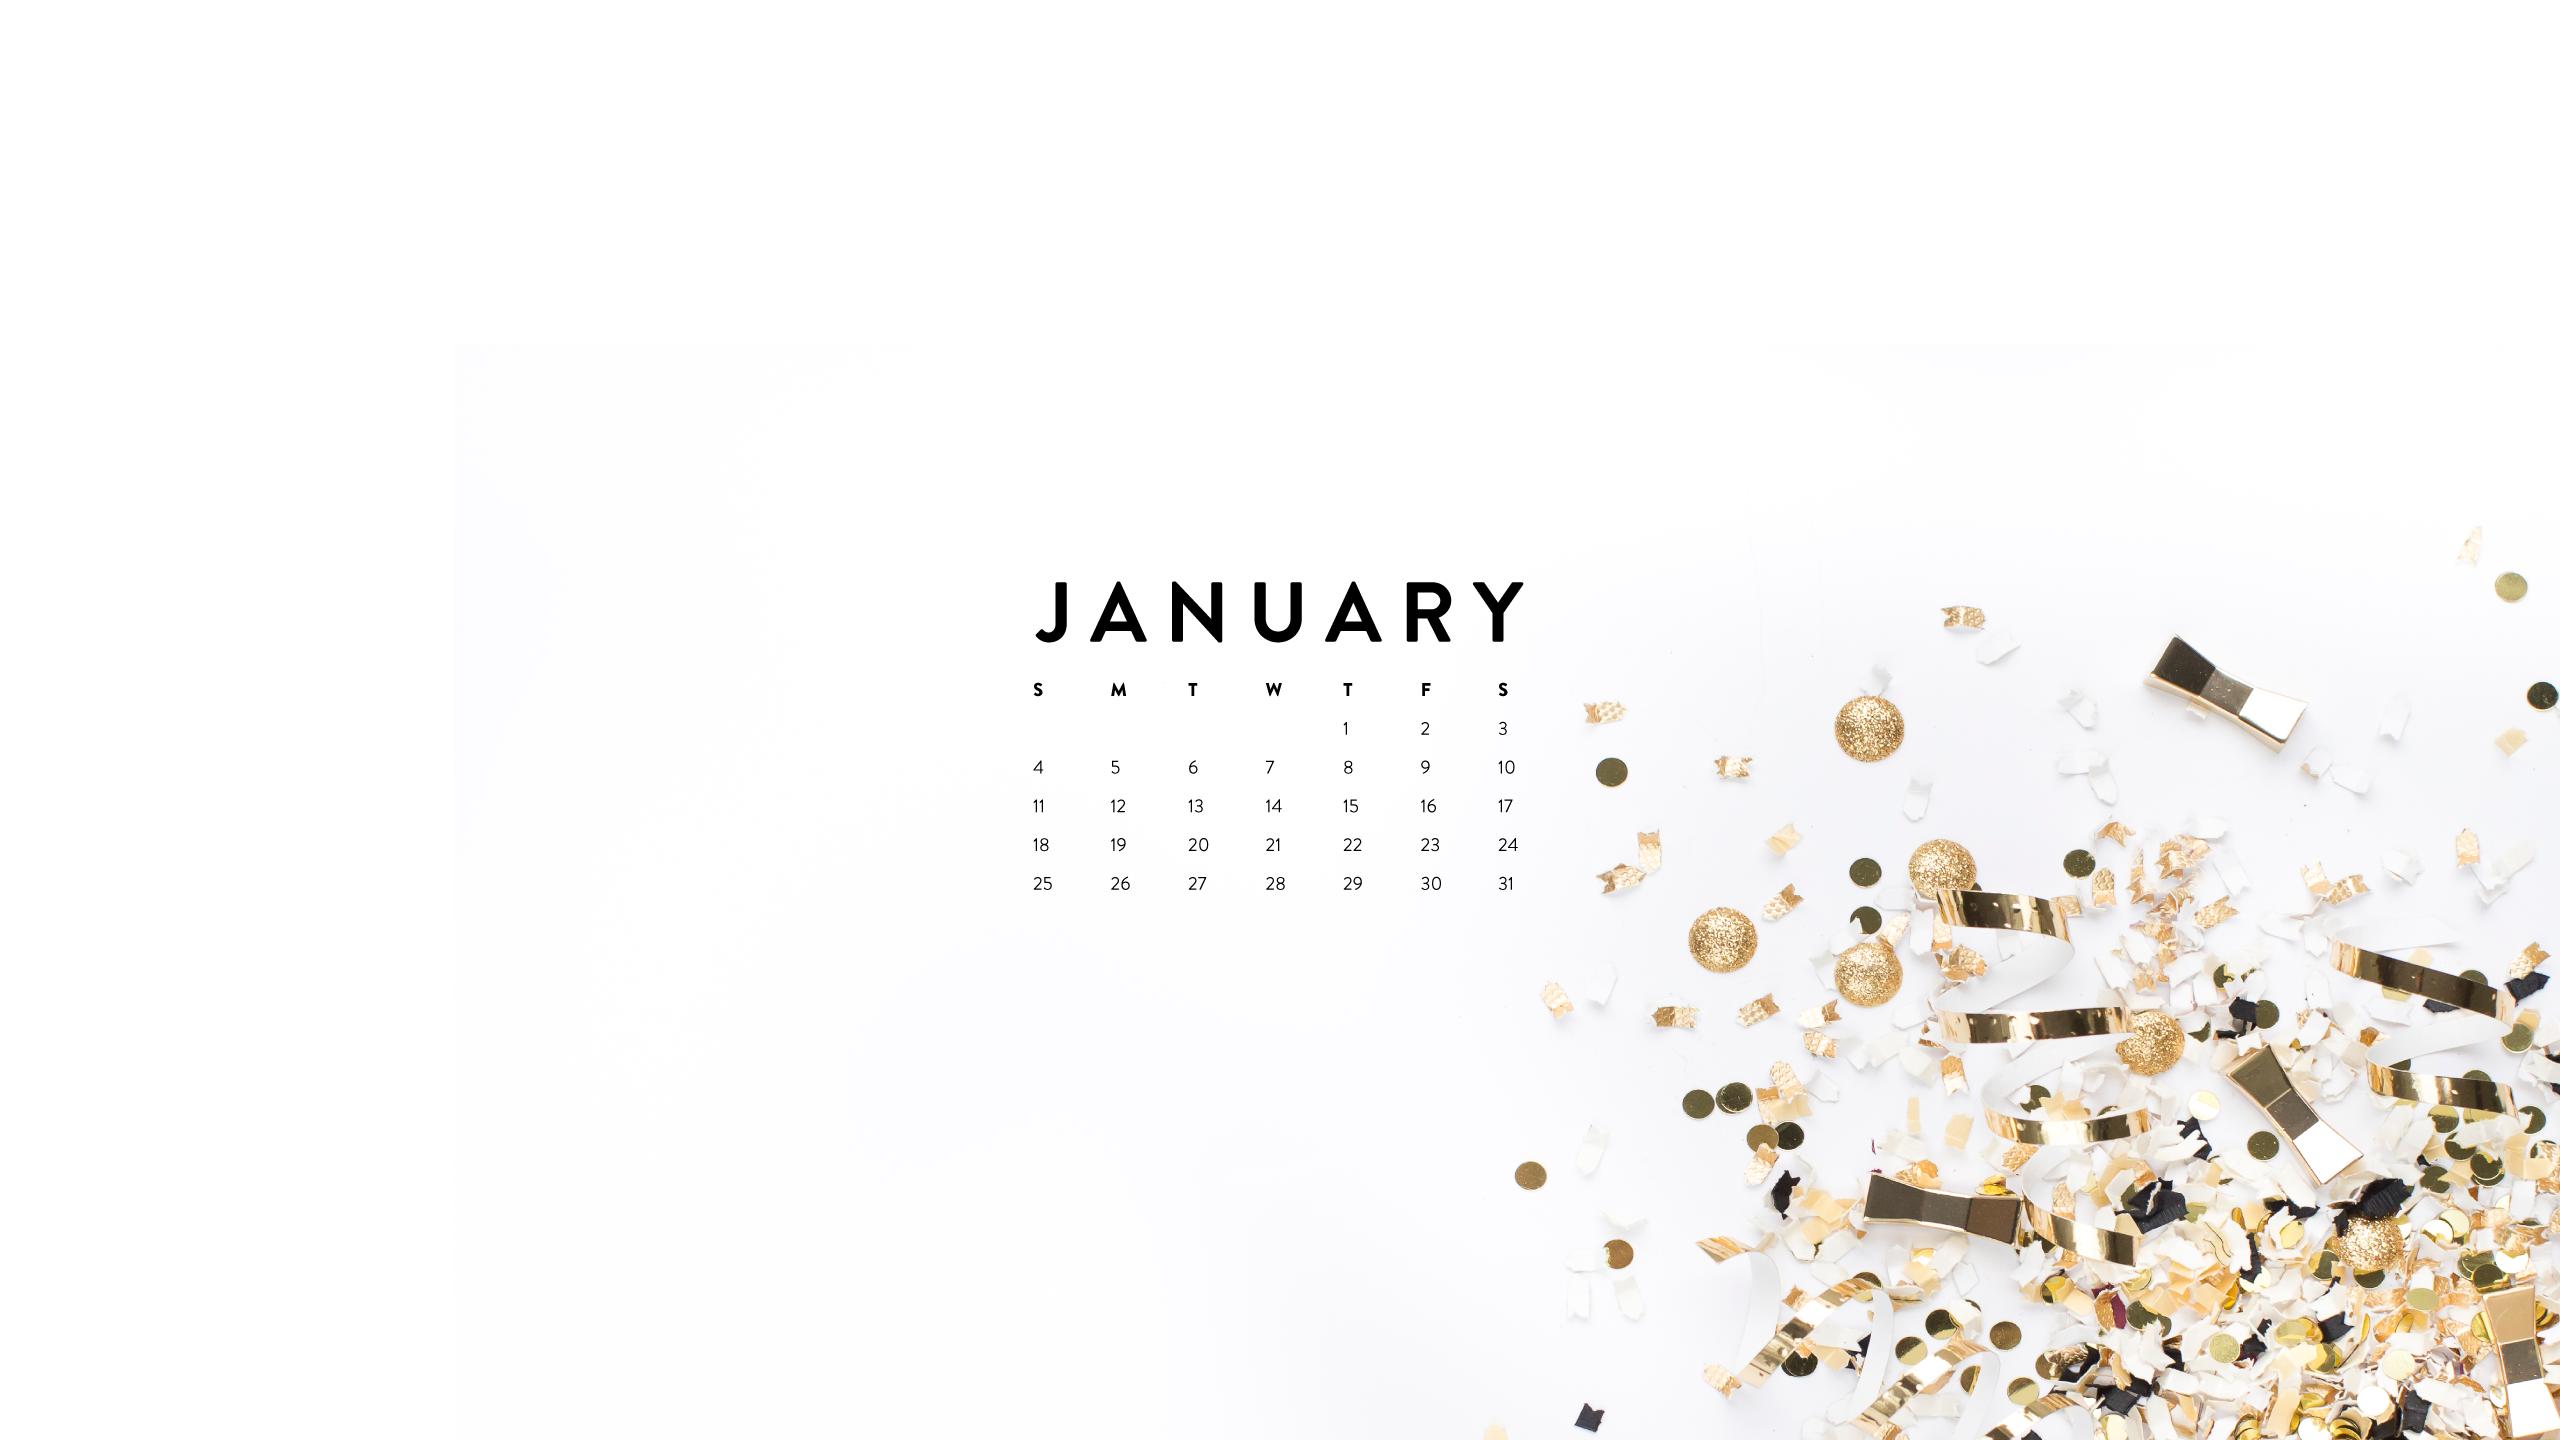 google calendar january 2016 wallpaper - photo #23